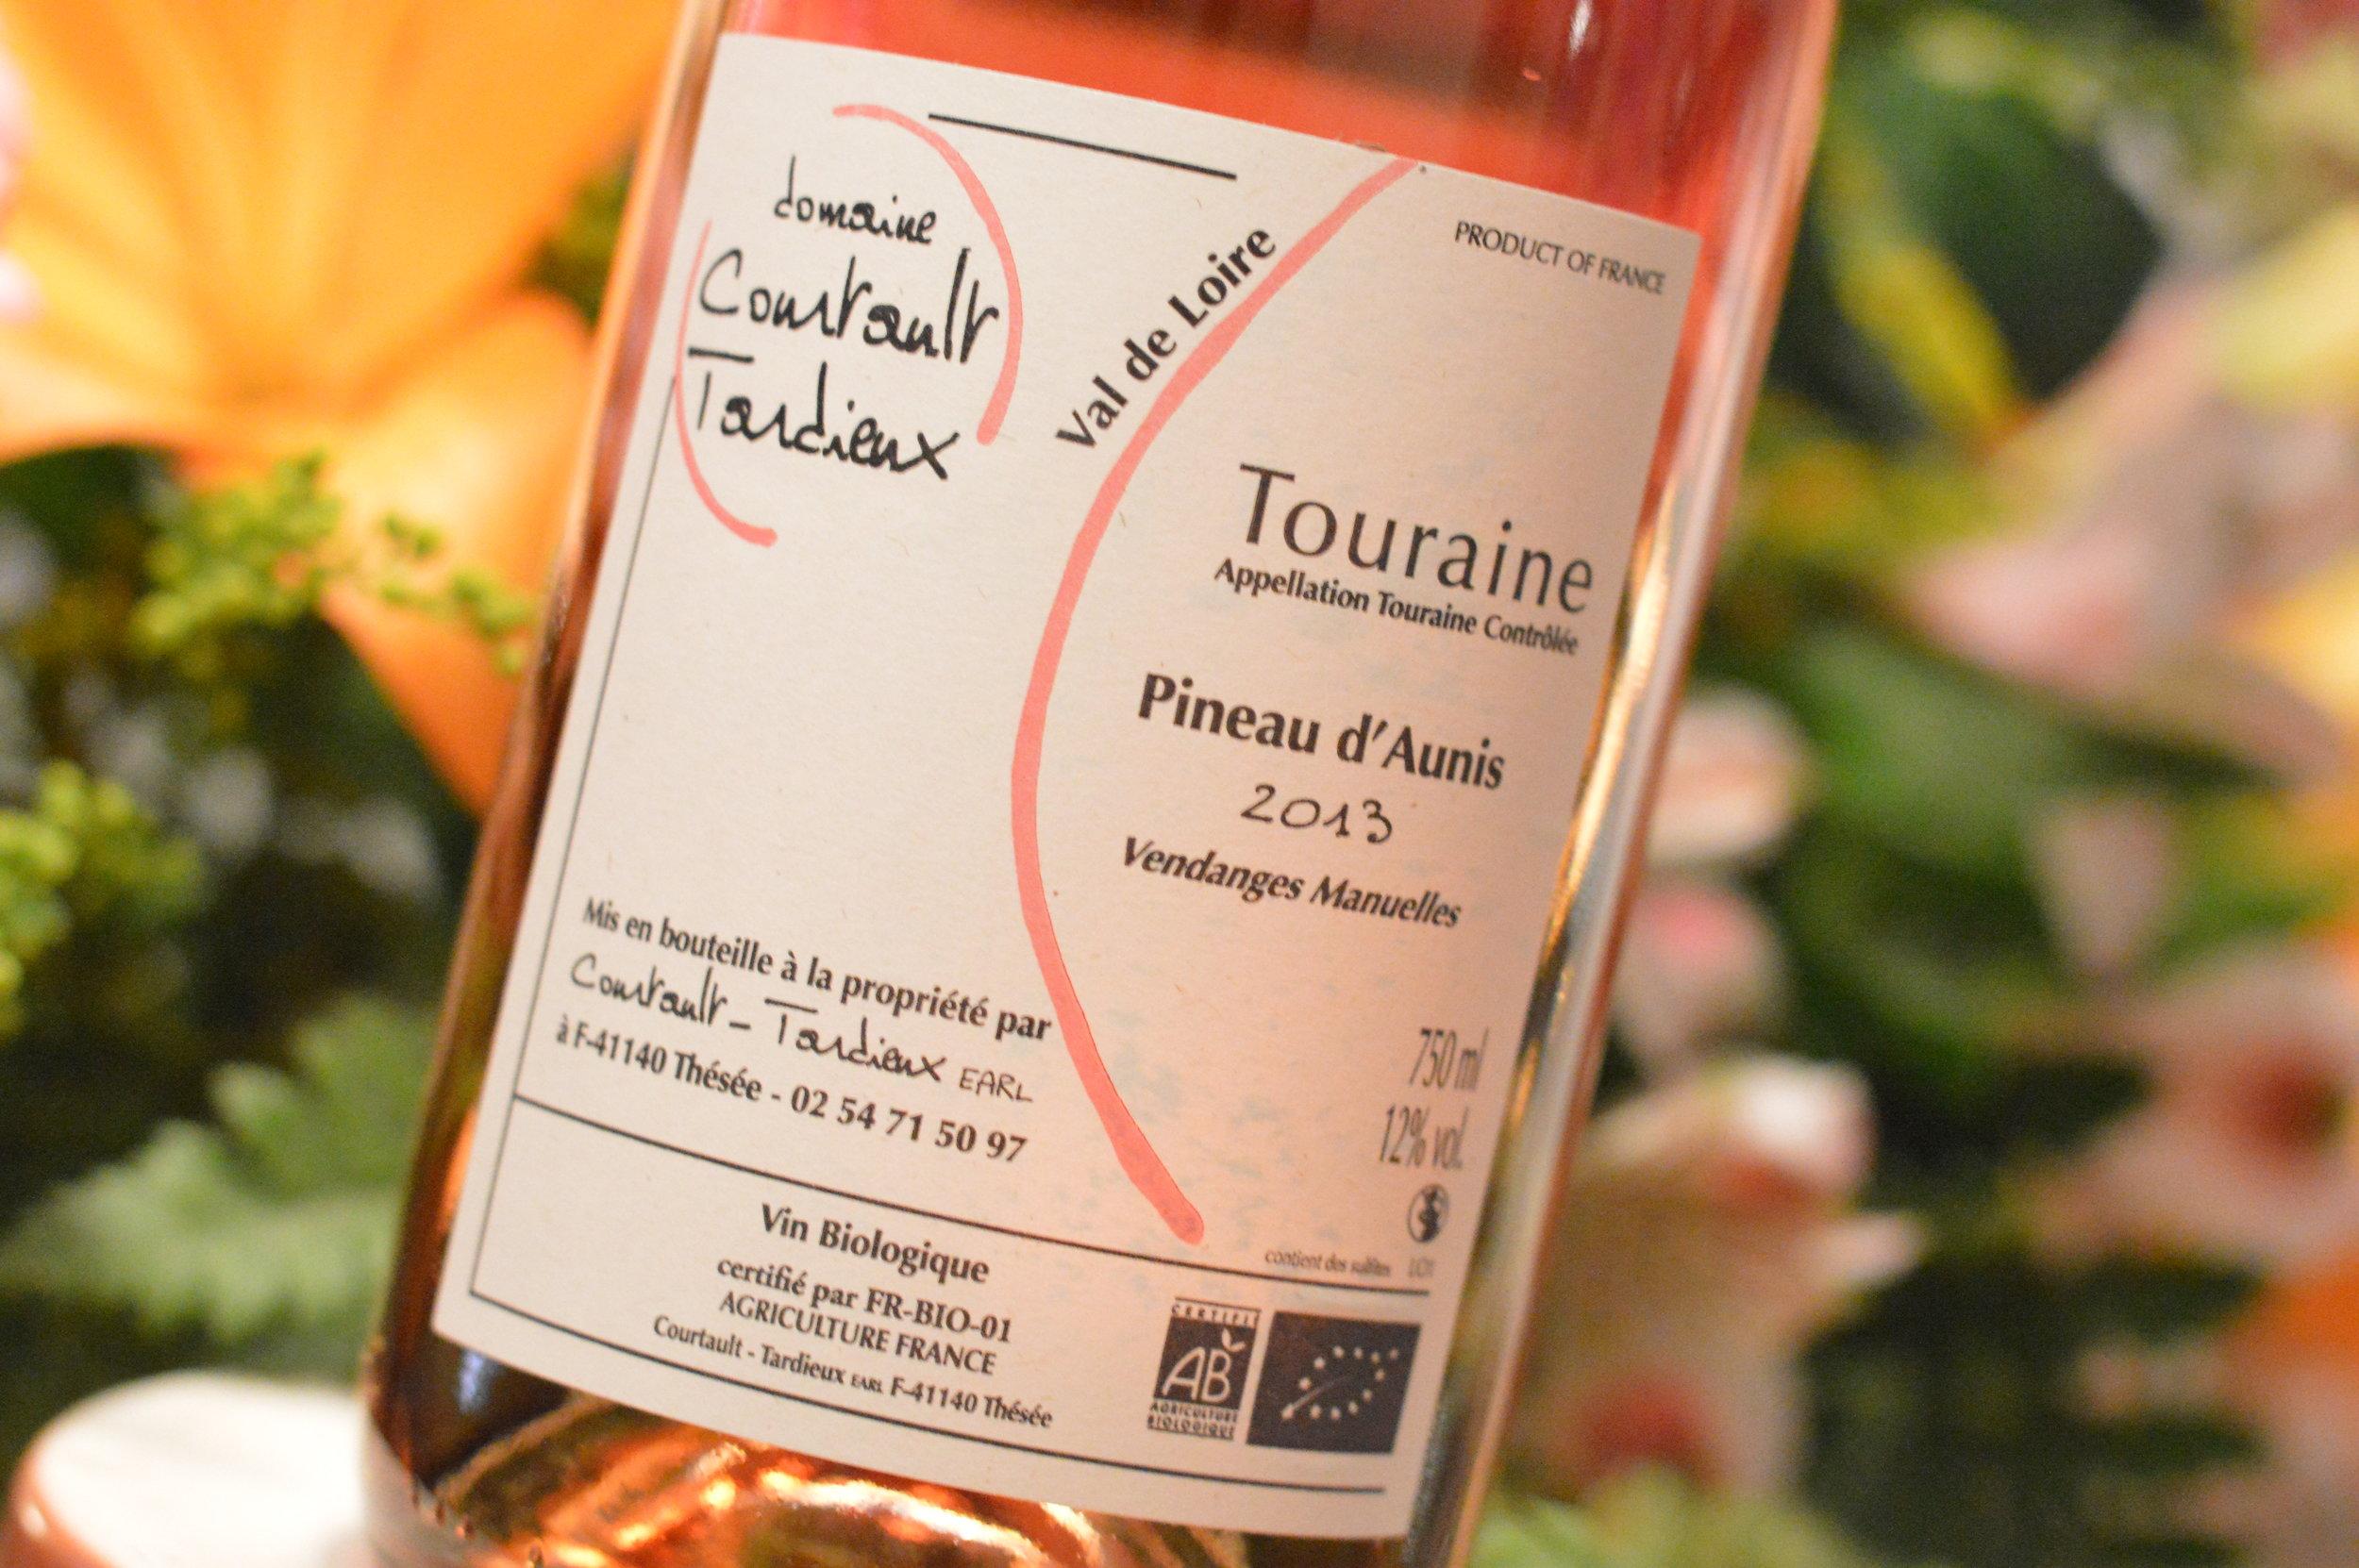 Courtualt Tardieux Rose